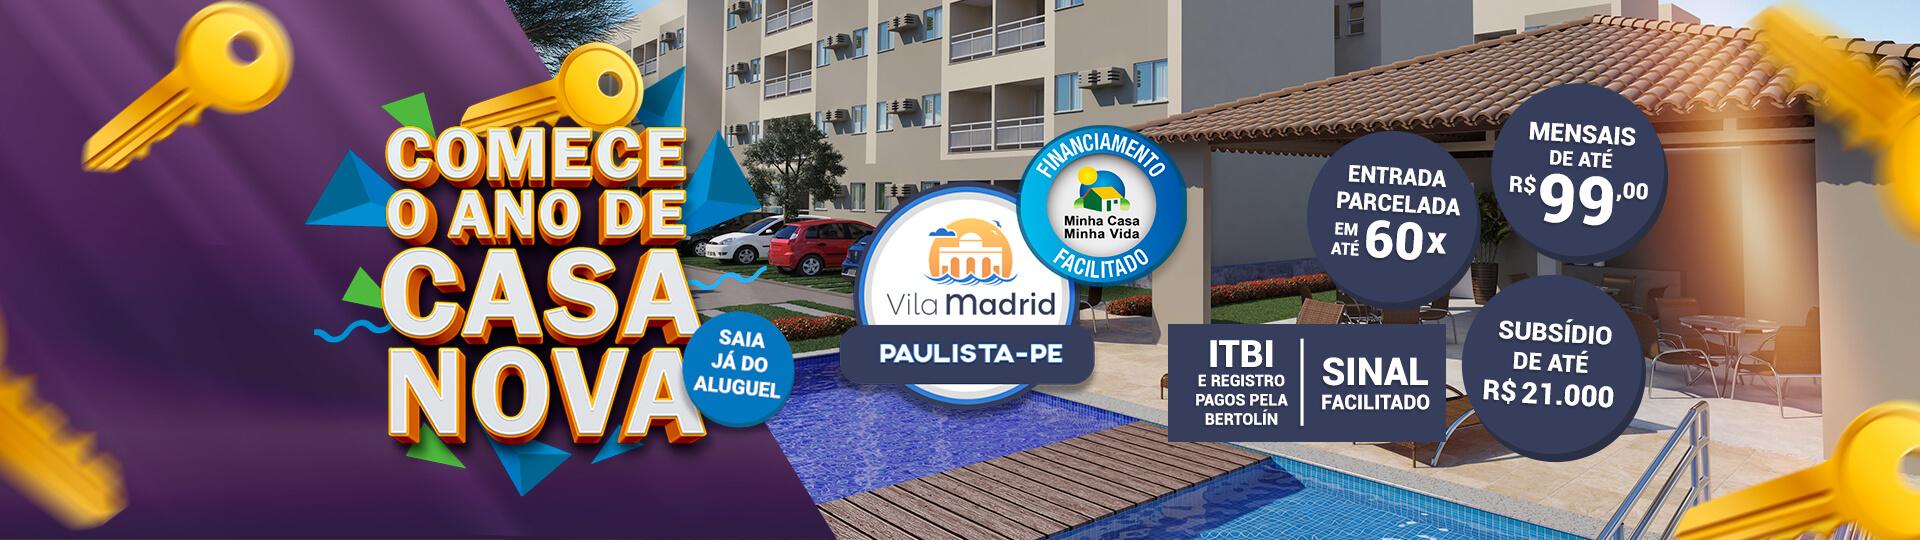 Destaque Vila Madrid